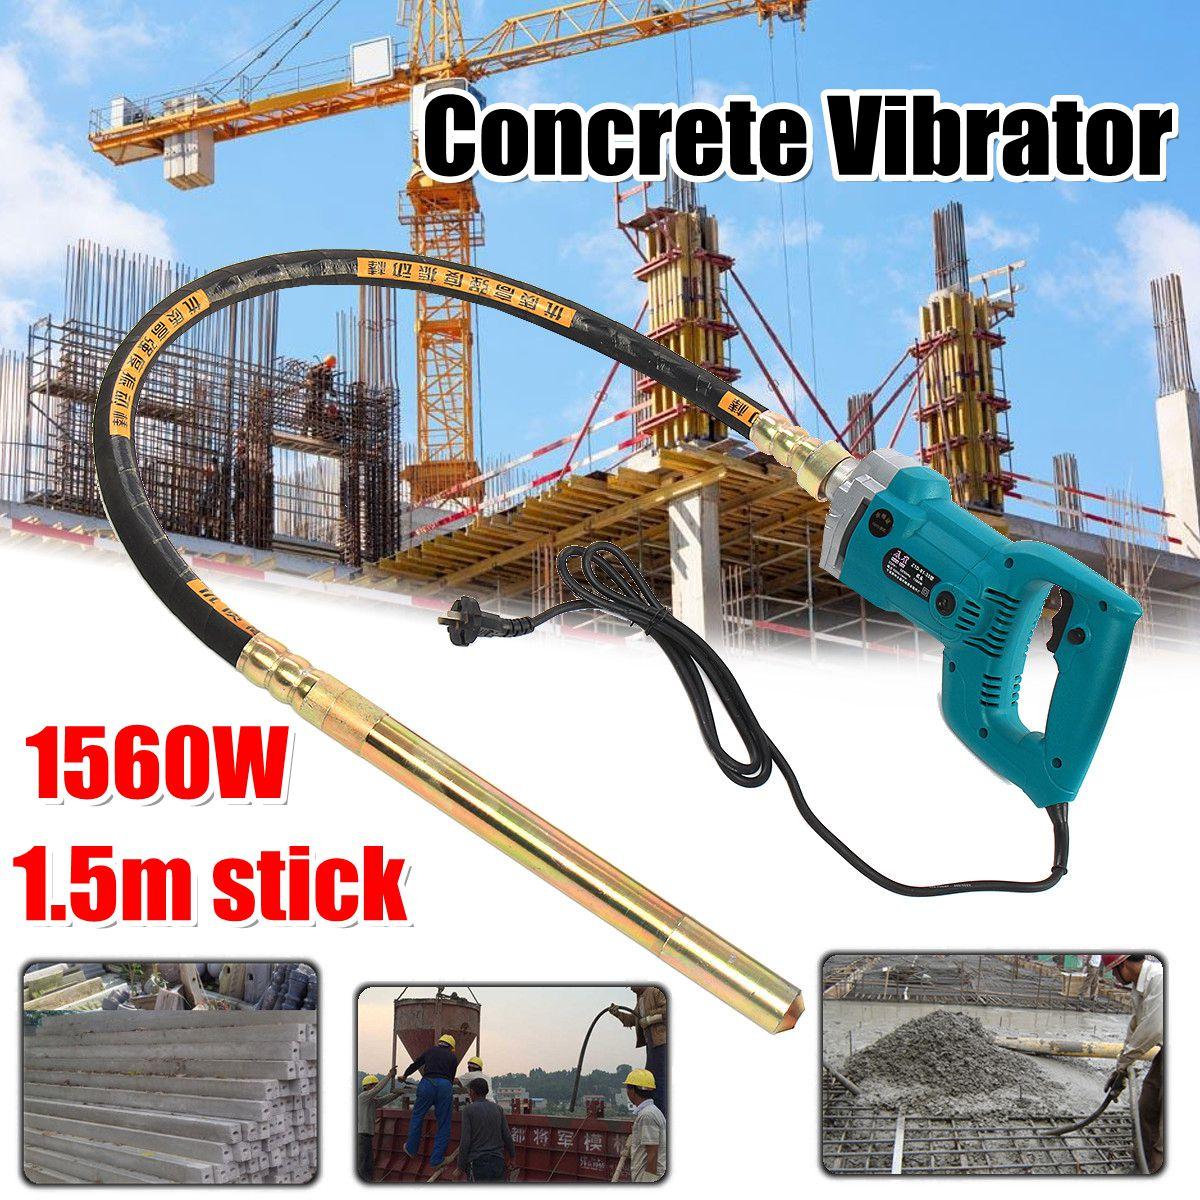 800W/1200W/1560W Concrete Vibrators Electric Cement Soil Mixer with Stick 3/4 HP- Heavy   Remove Air Bubbles & Level 5000 VPM800W/1200W/1560W Concrete Vibrators Electric Cement Soil Mixer with Stick 3/4 HP- Heavy   Remove Air Bubbles & Level 5000 VPM